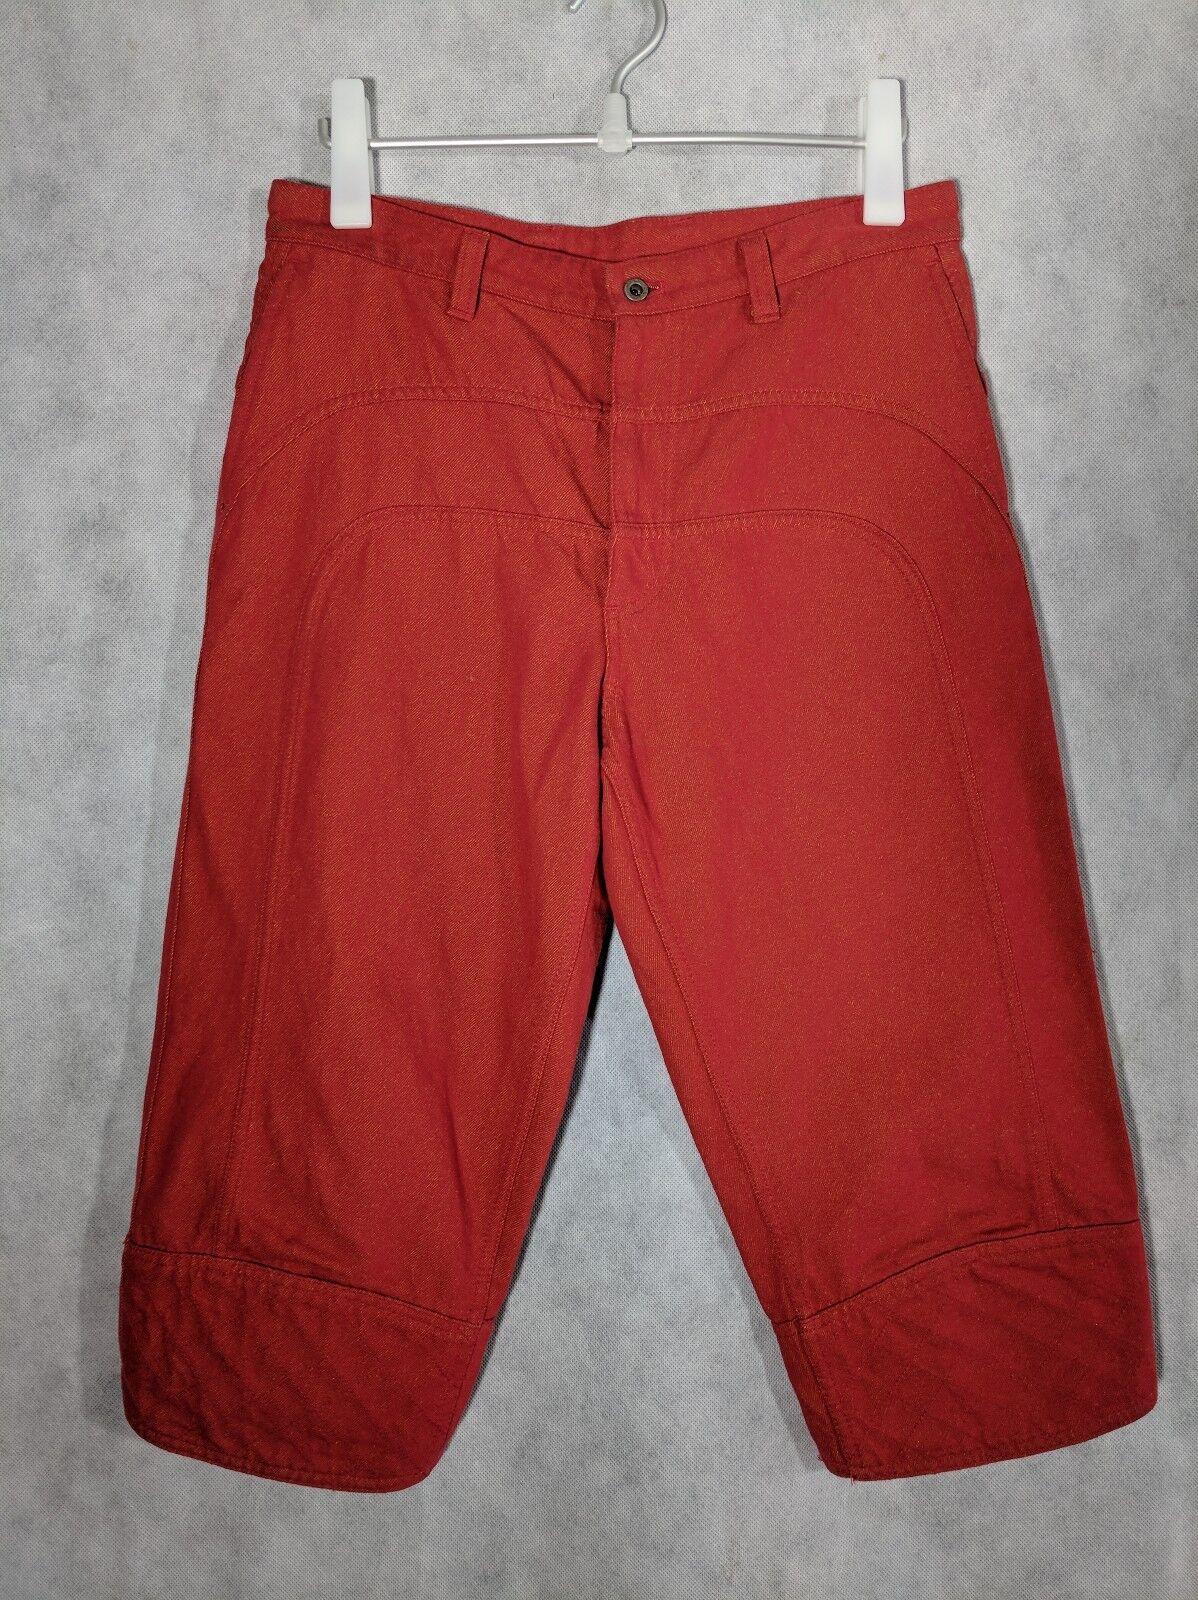 Issey Miyake Red Denim Cropped Jeans Shorts 32